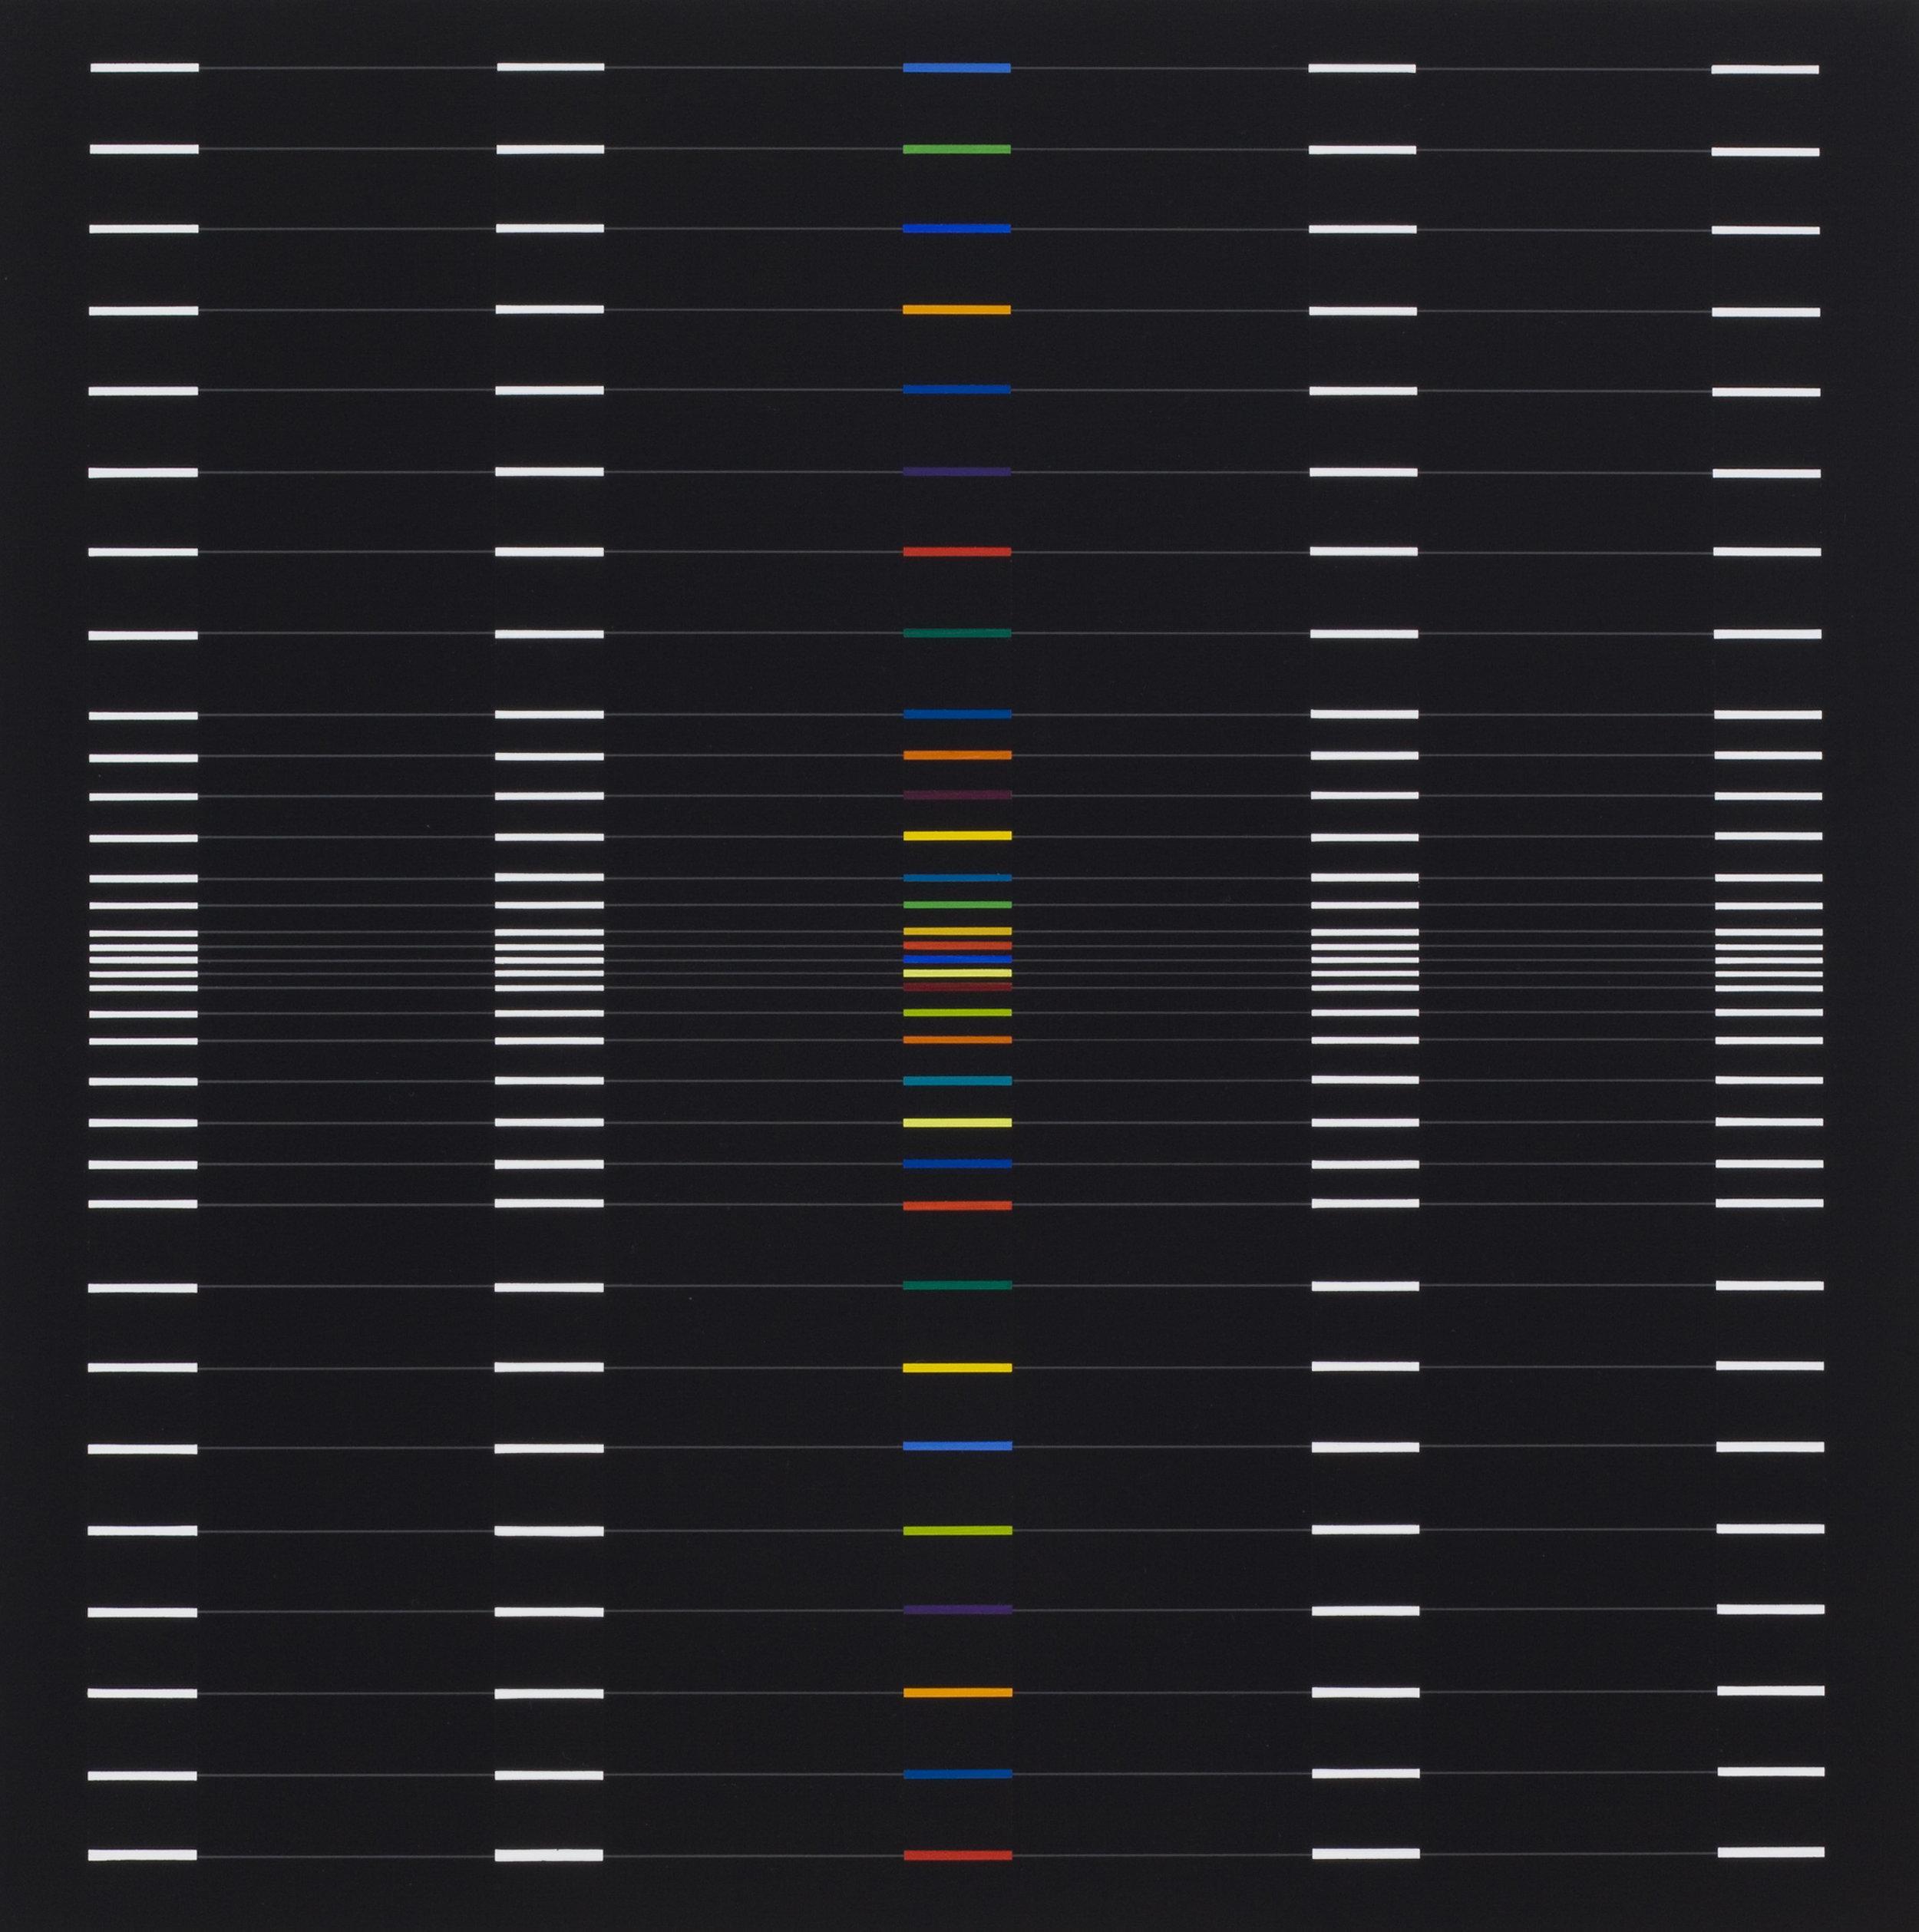 Verticalis[Horizontalis]-2 2013 acrylic on canvas, 17 3/4 x 17 3/4 in. [45x45cm]